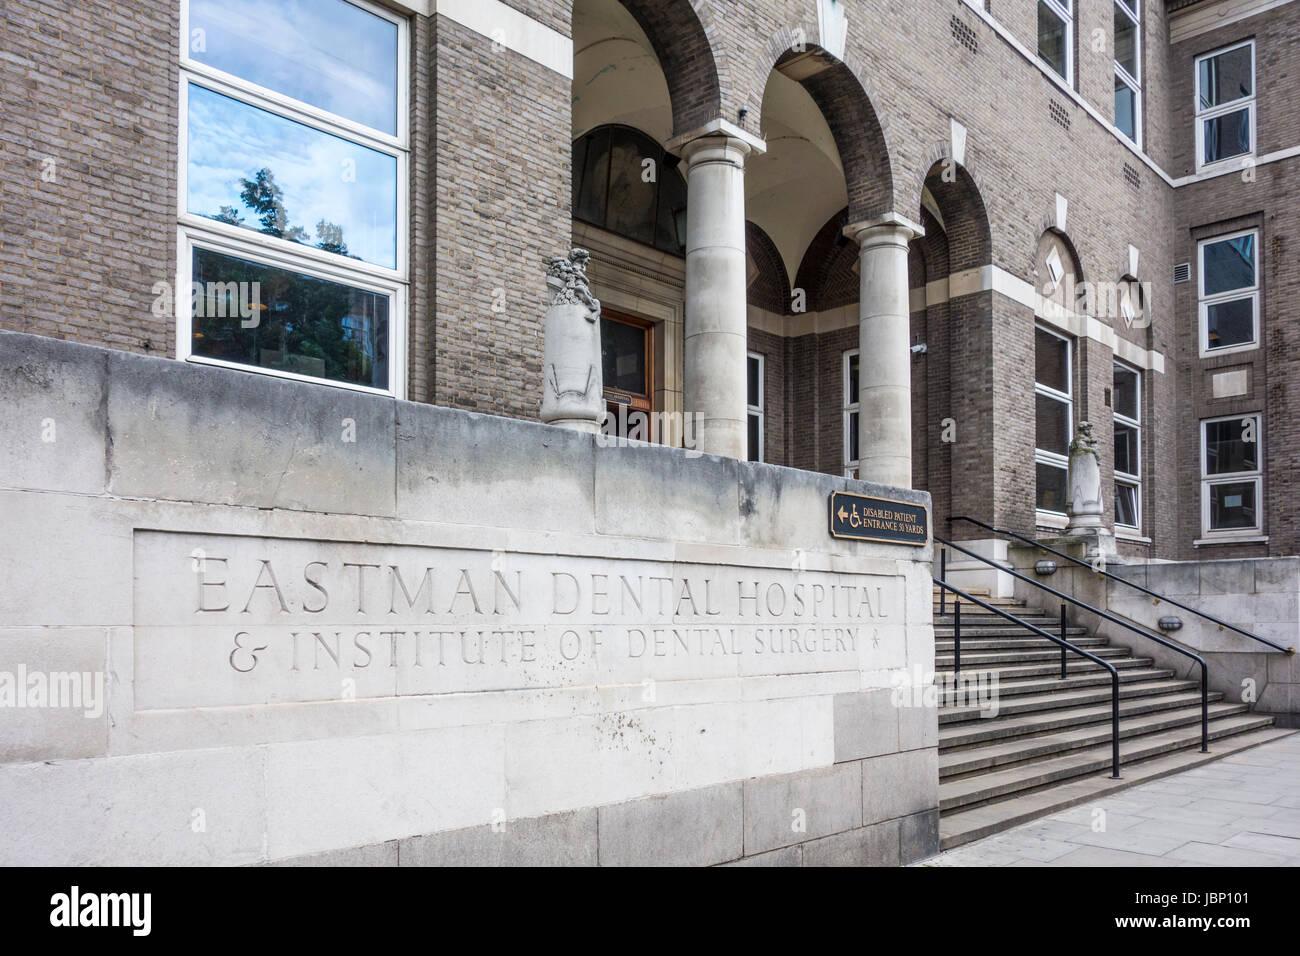 Sign outside entrance to Eastman Dental Hospital, Institute of Dental Surgery, University College London Hospitals - Stock Image